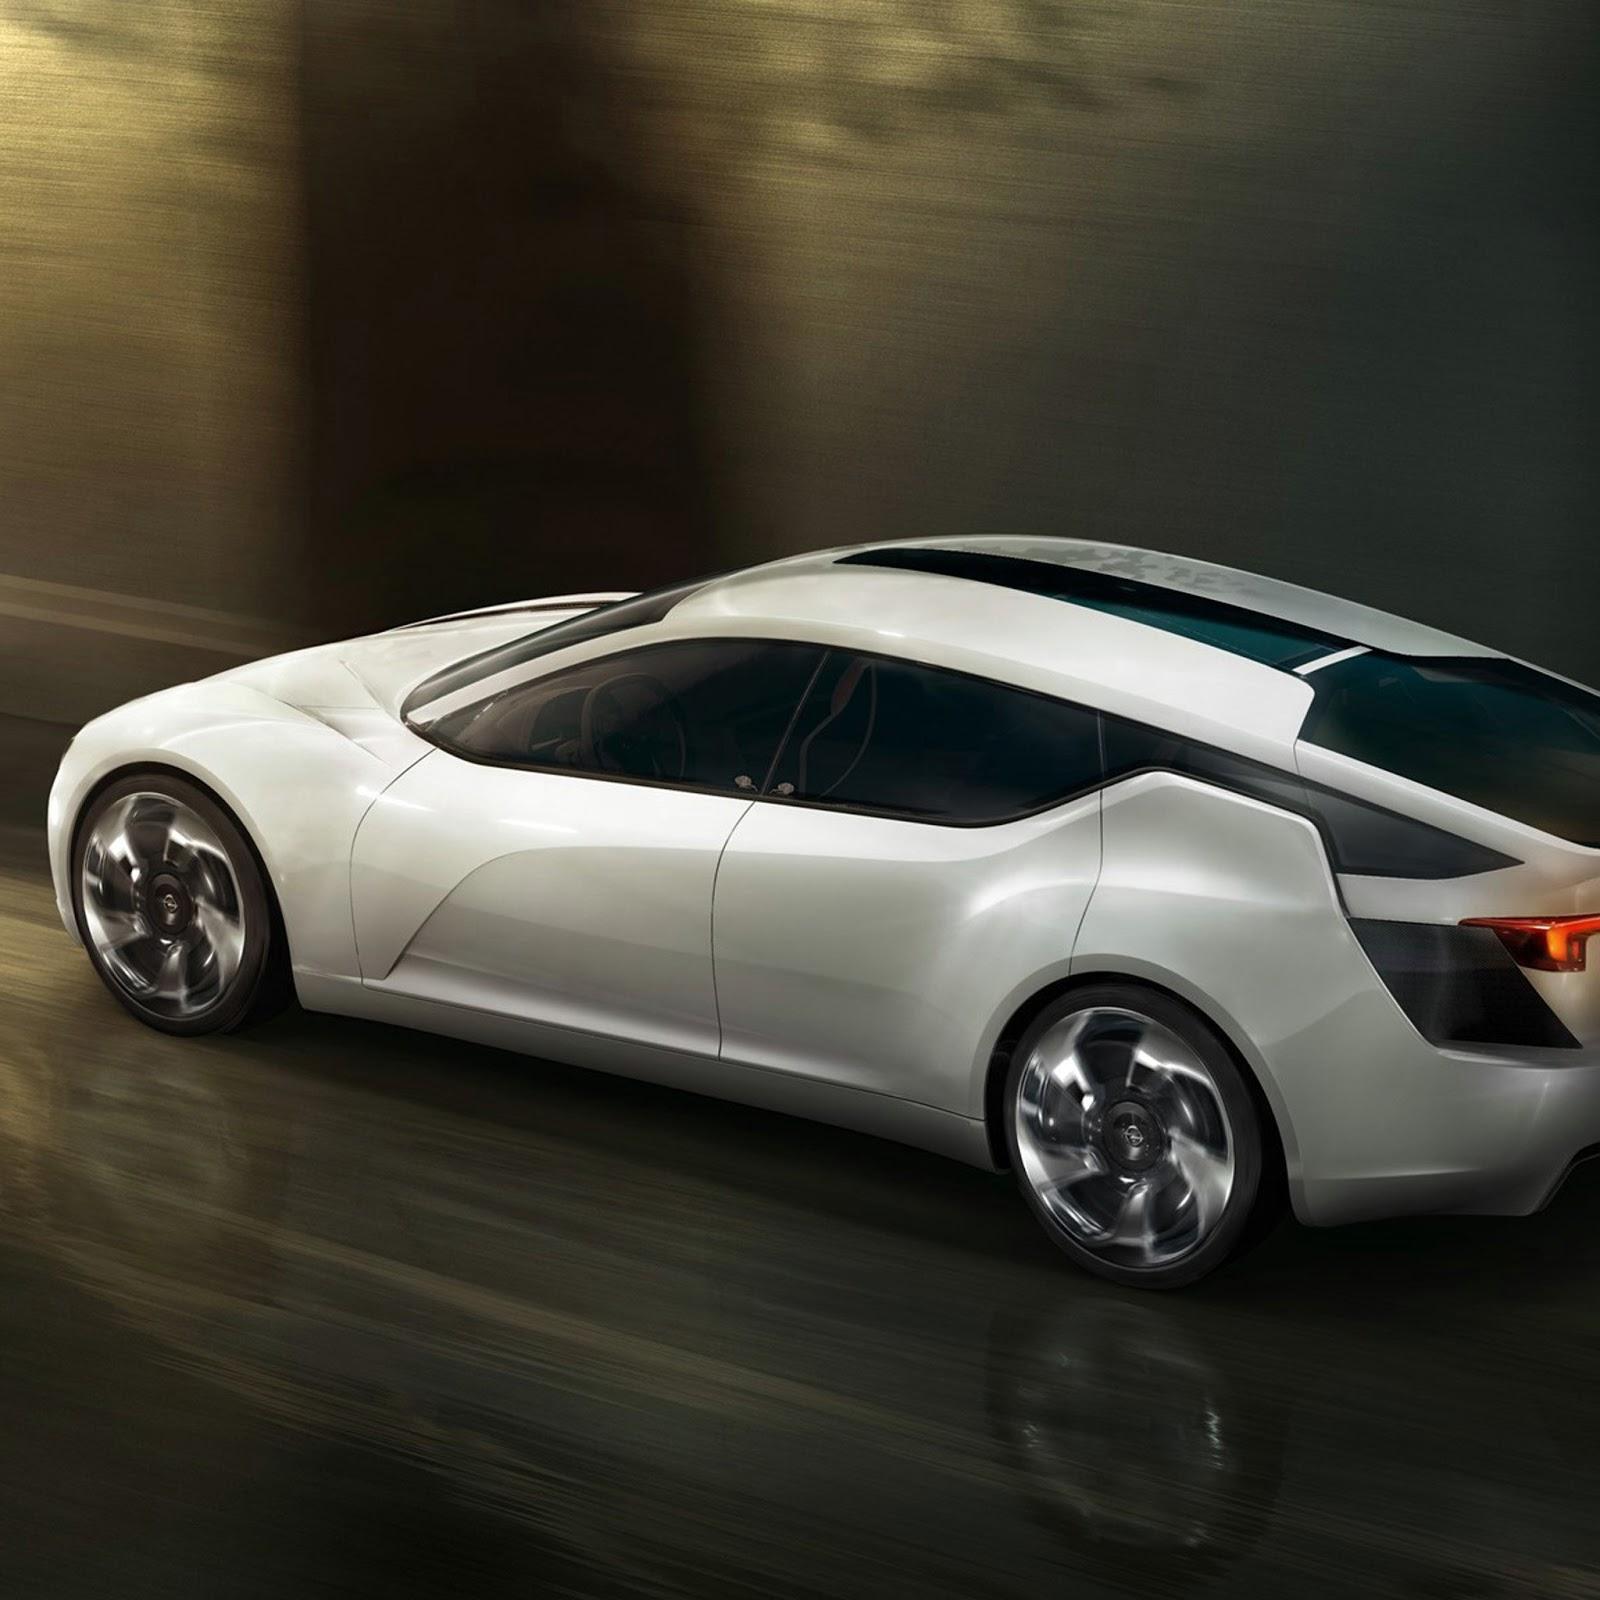 Opel Car Wallpaper: Opel Flextreme Gt E Concept 2 Wallpapers